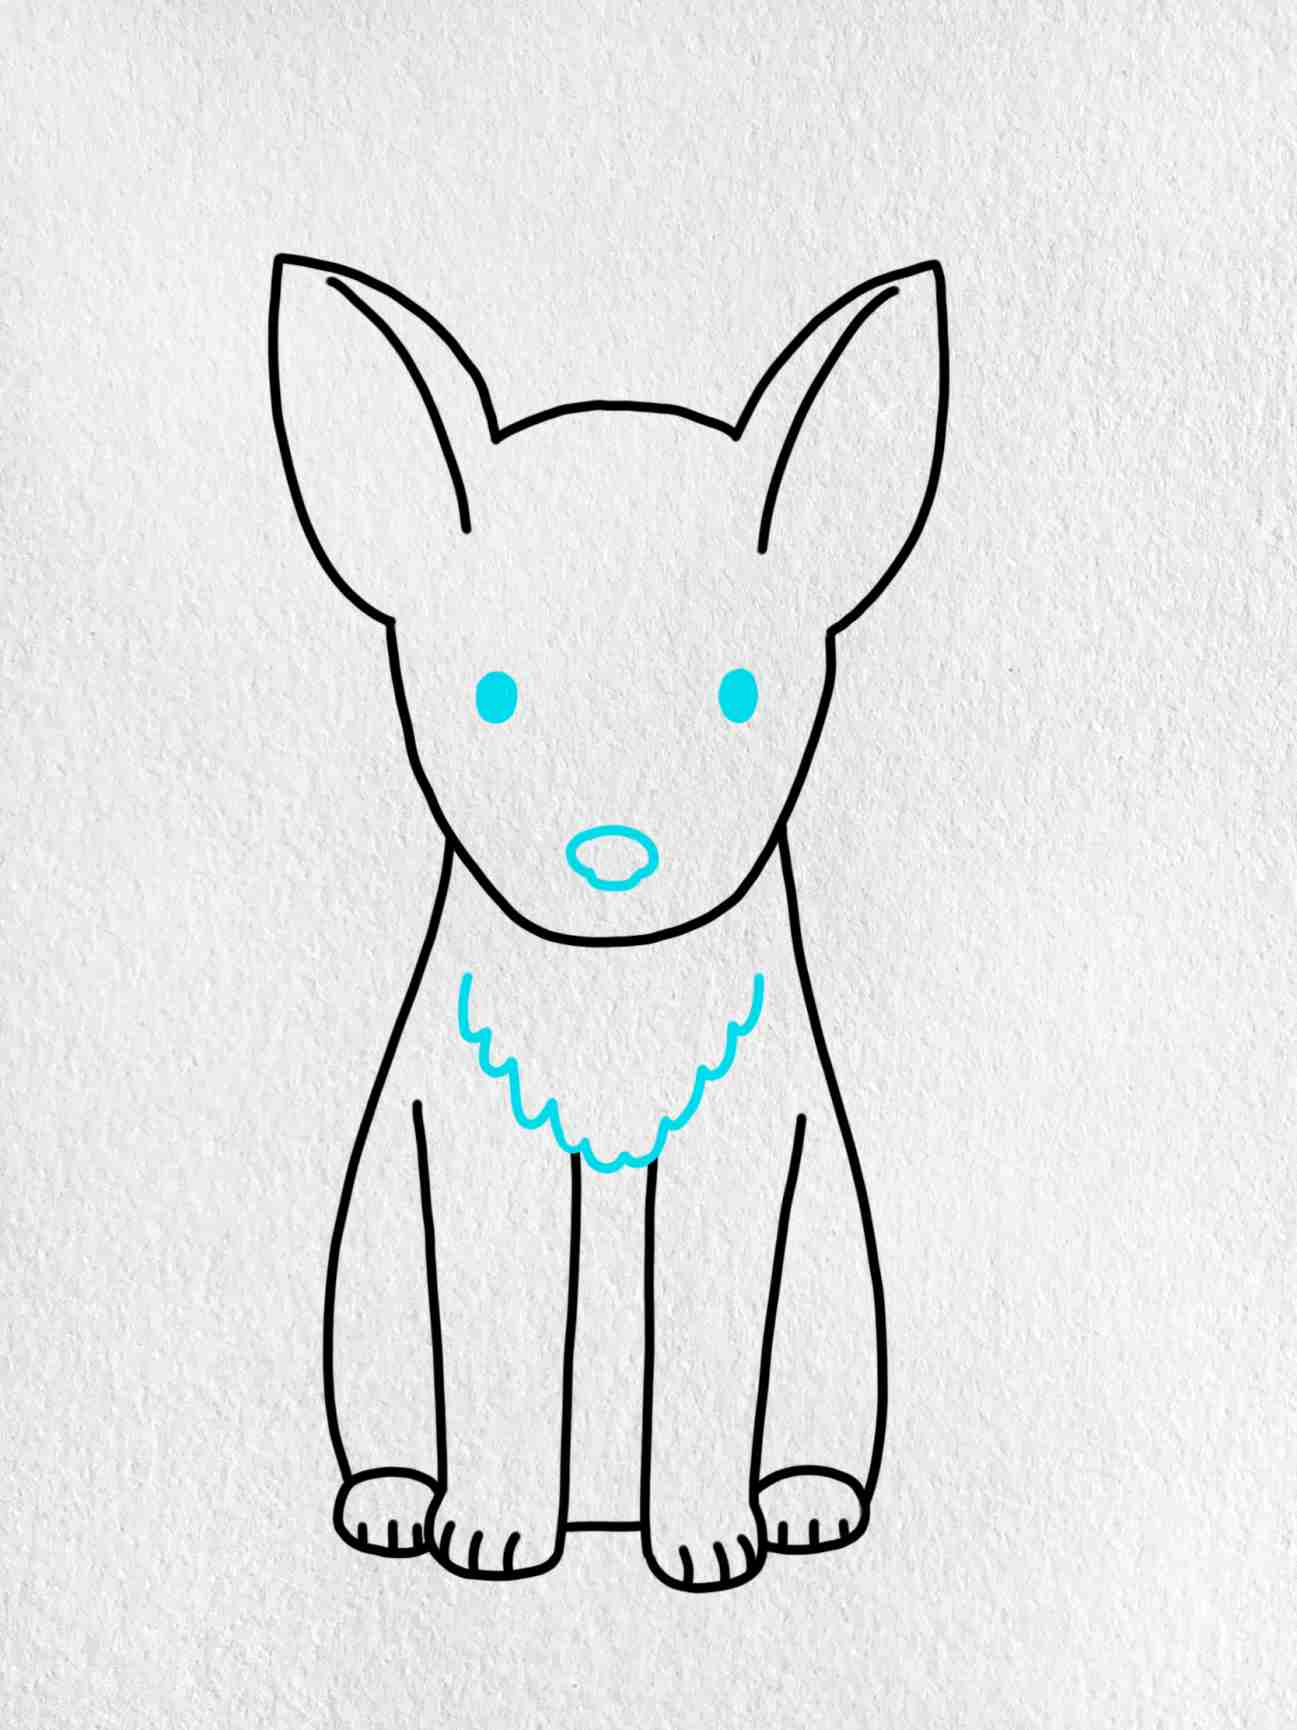 How To Draw A German Shepherd: Step 5